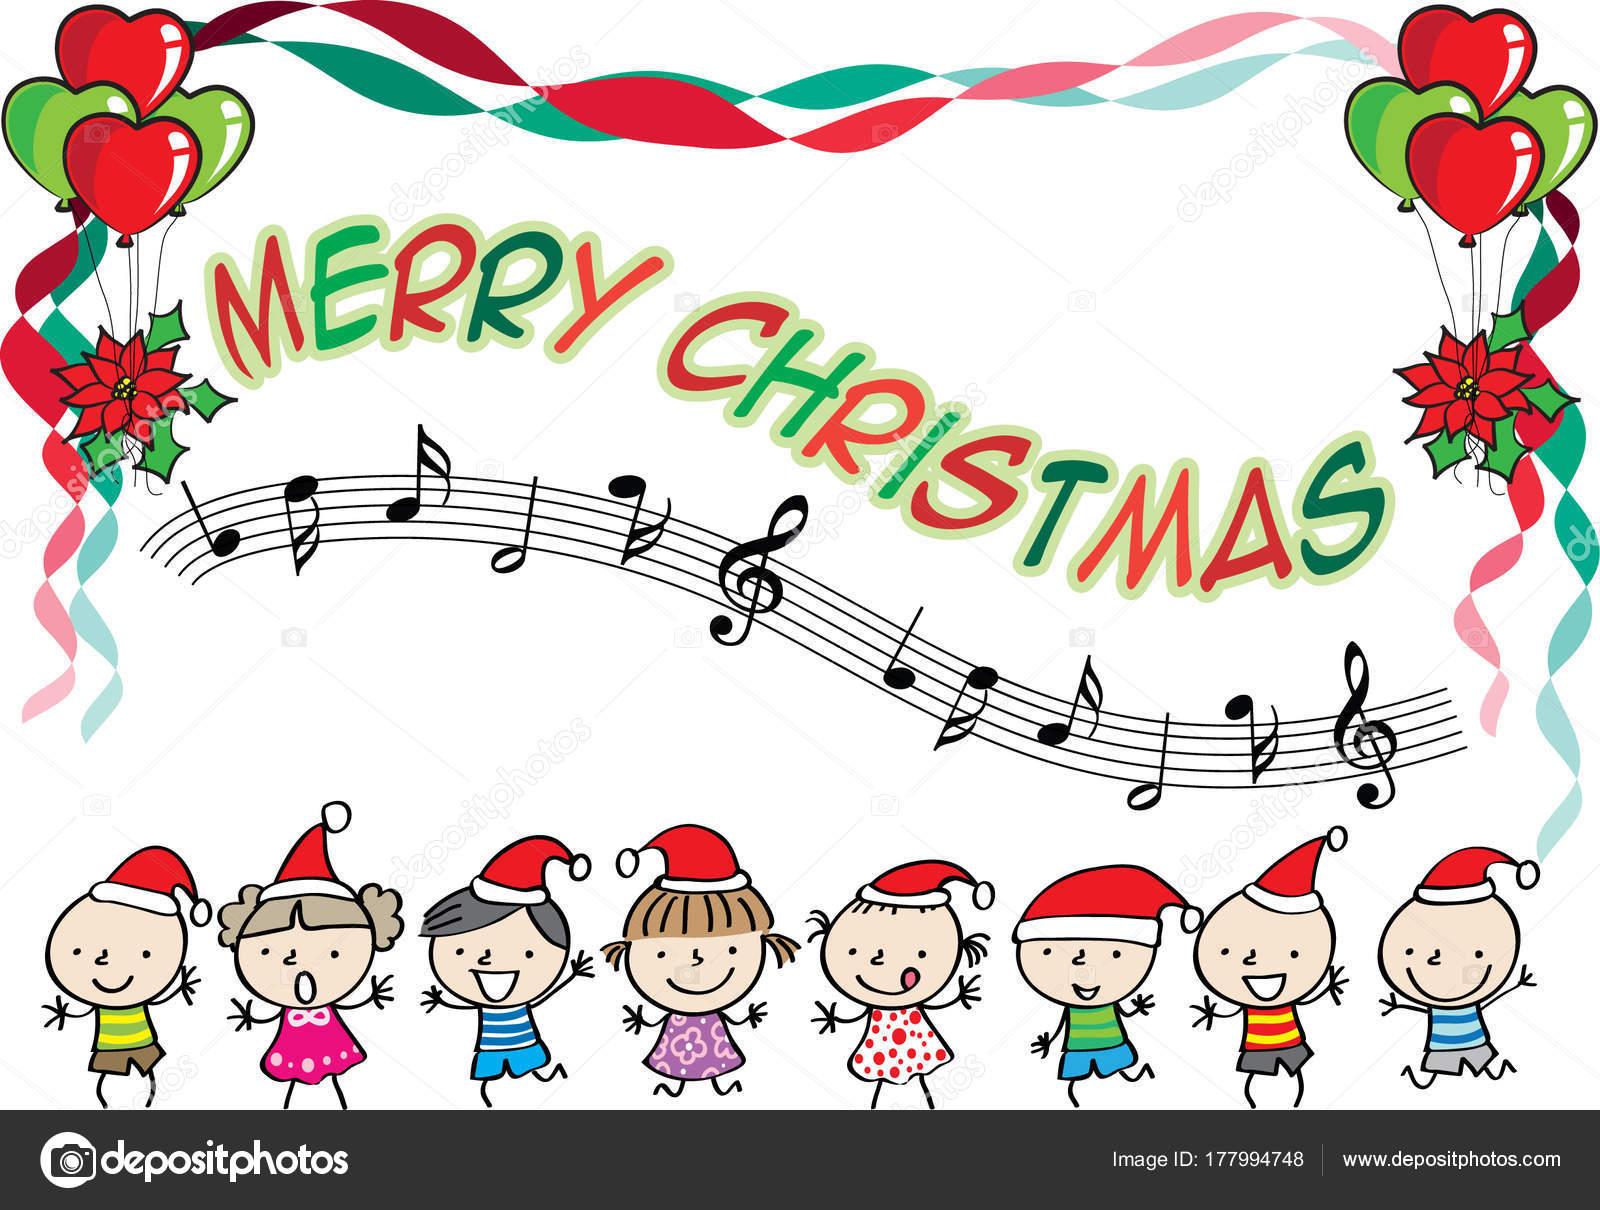 Chanson Joyeux Noel.Enfants Chantent Chanson Avec Joyeux Noel Image